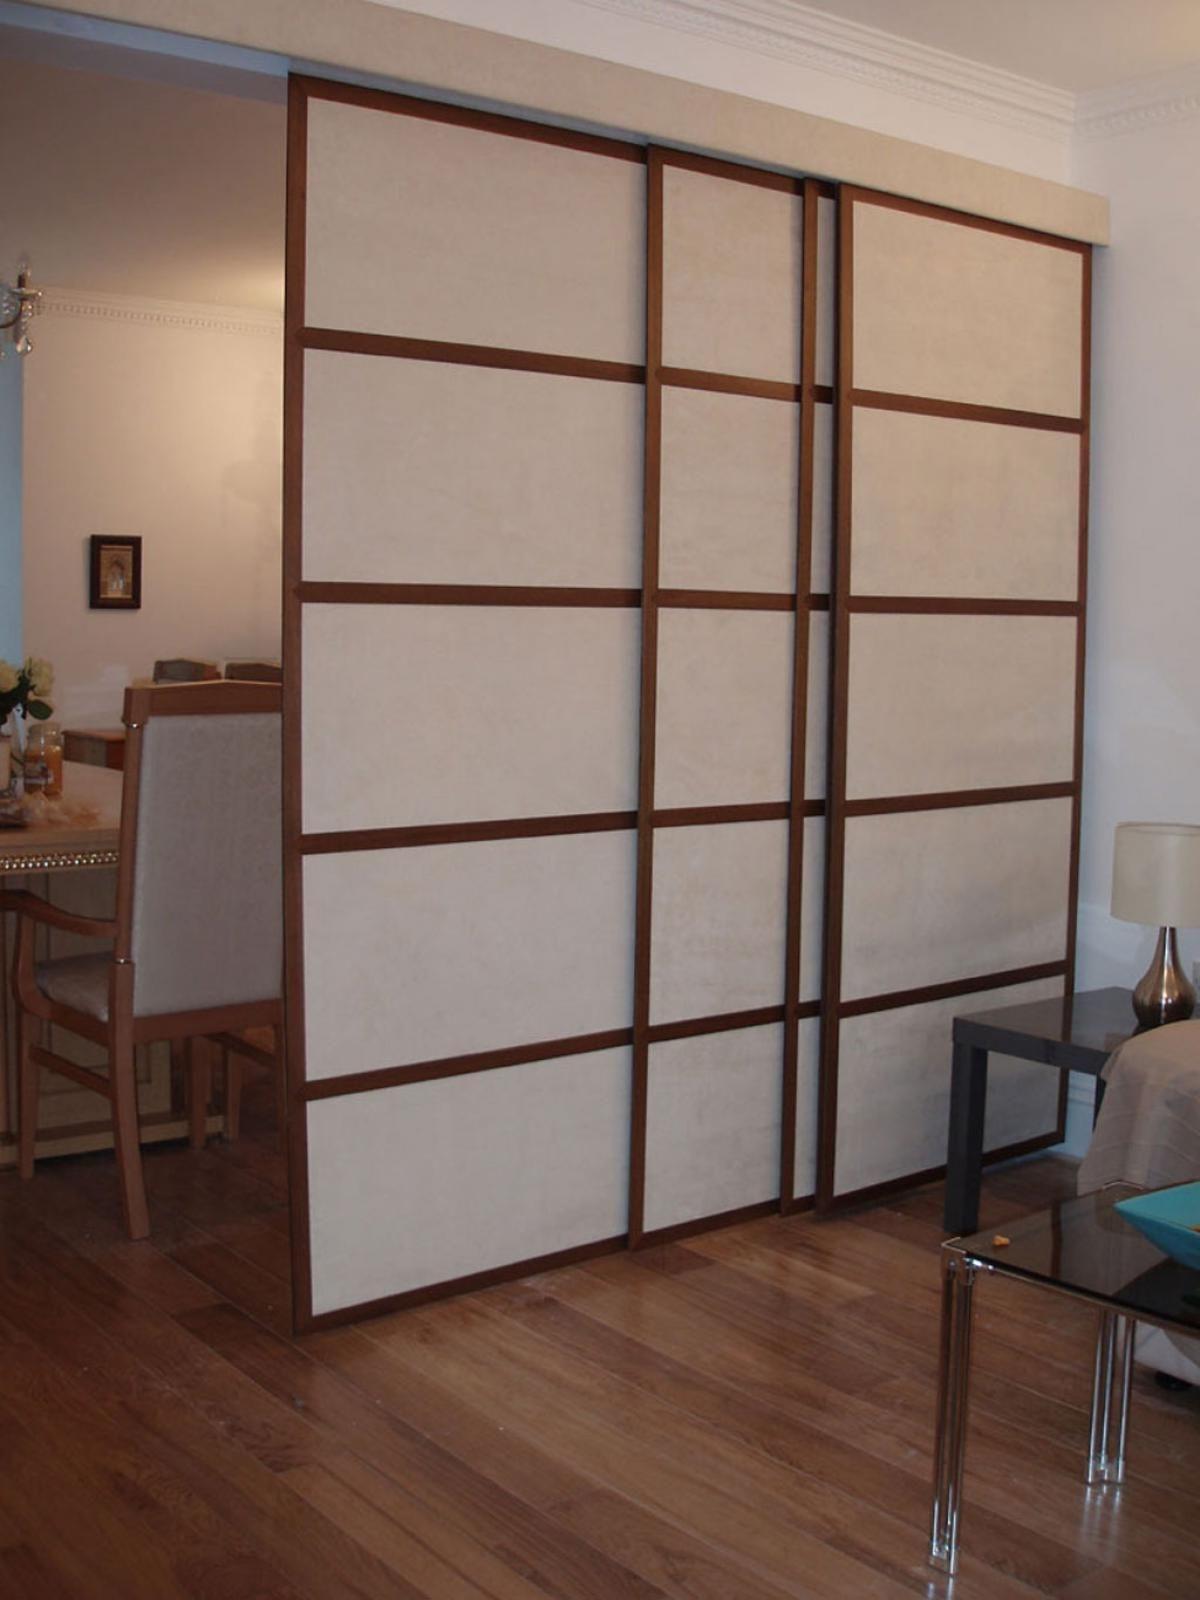 Sliding Room Dividers Diy. Simple Curtain Curtain Room .